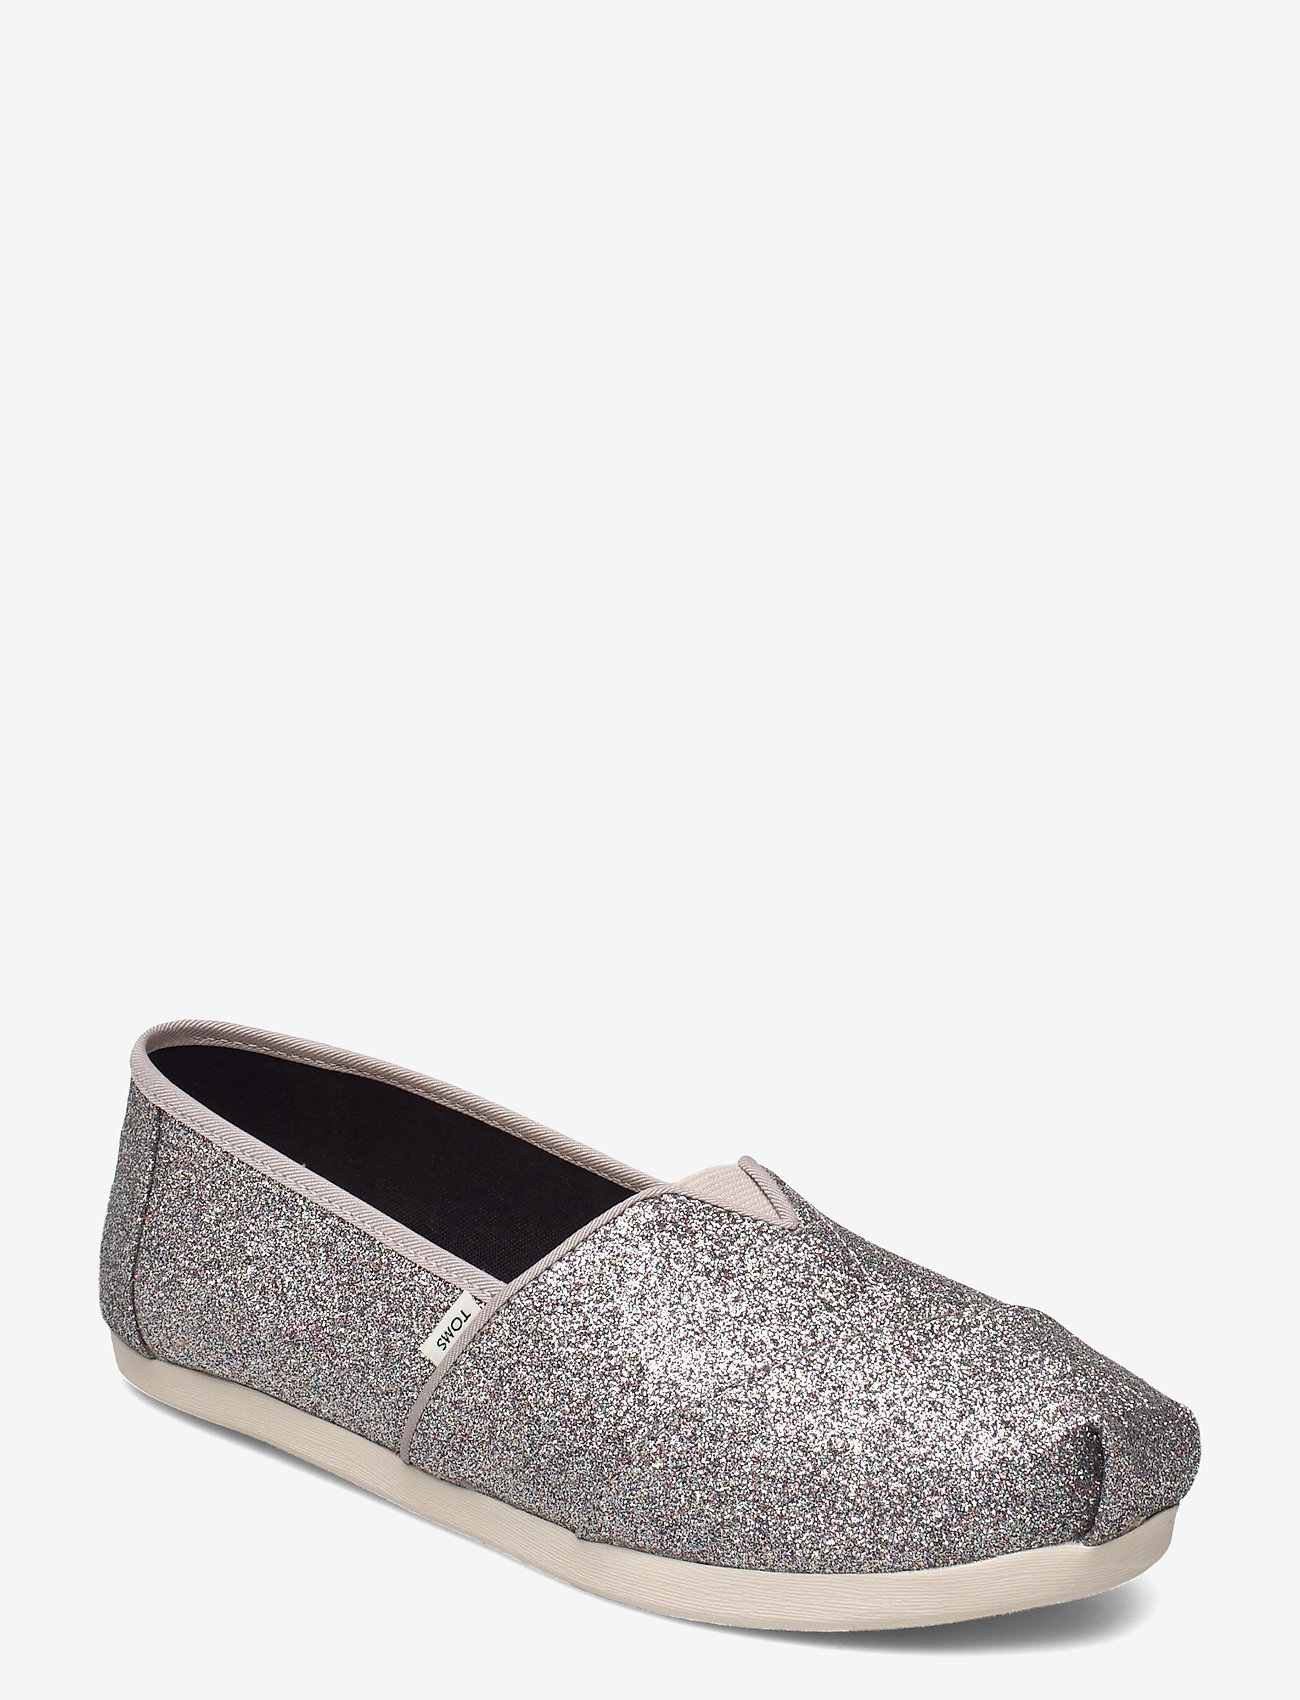 TOMS - Silver Iridescent Glimmer - platta espadriller - silver - 0